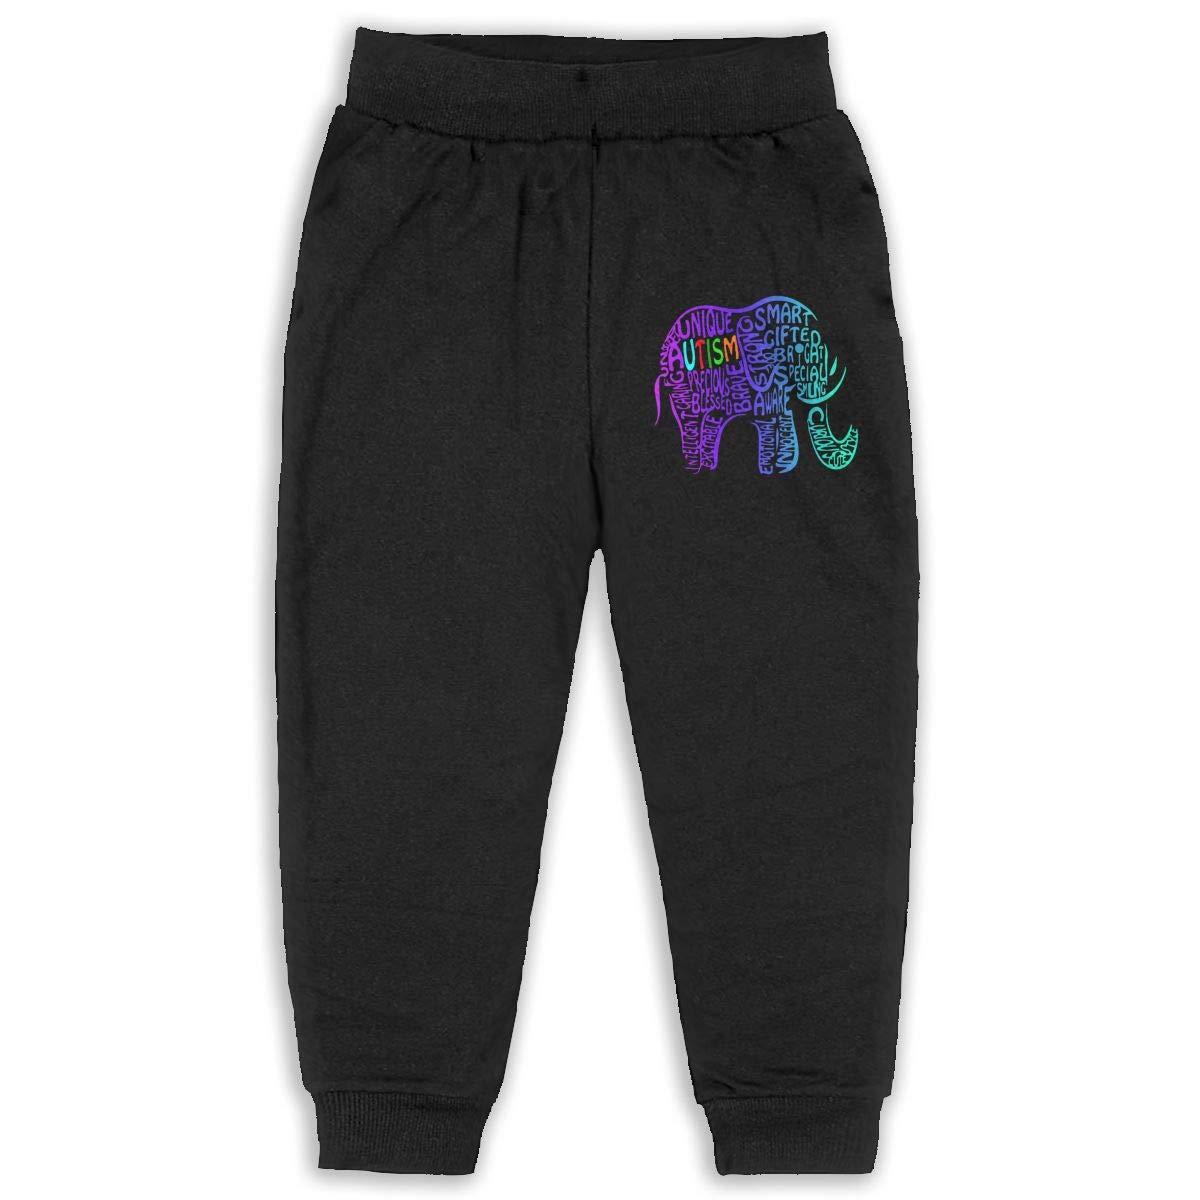 Udyi/&Jln-97 Autism Awareness Elephant Unisex Kid Toddler Pants Soft Cozy Boys /& Girls Jogger Play Pant